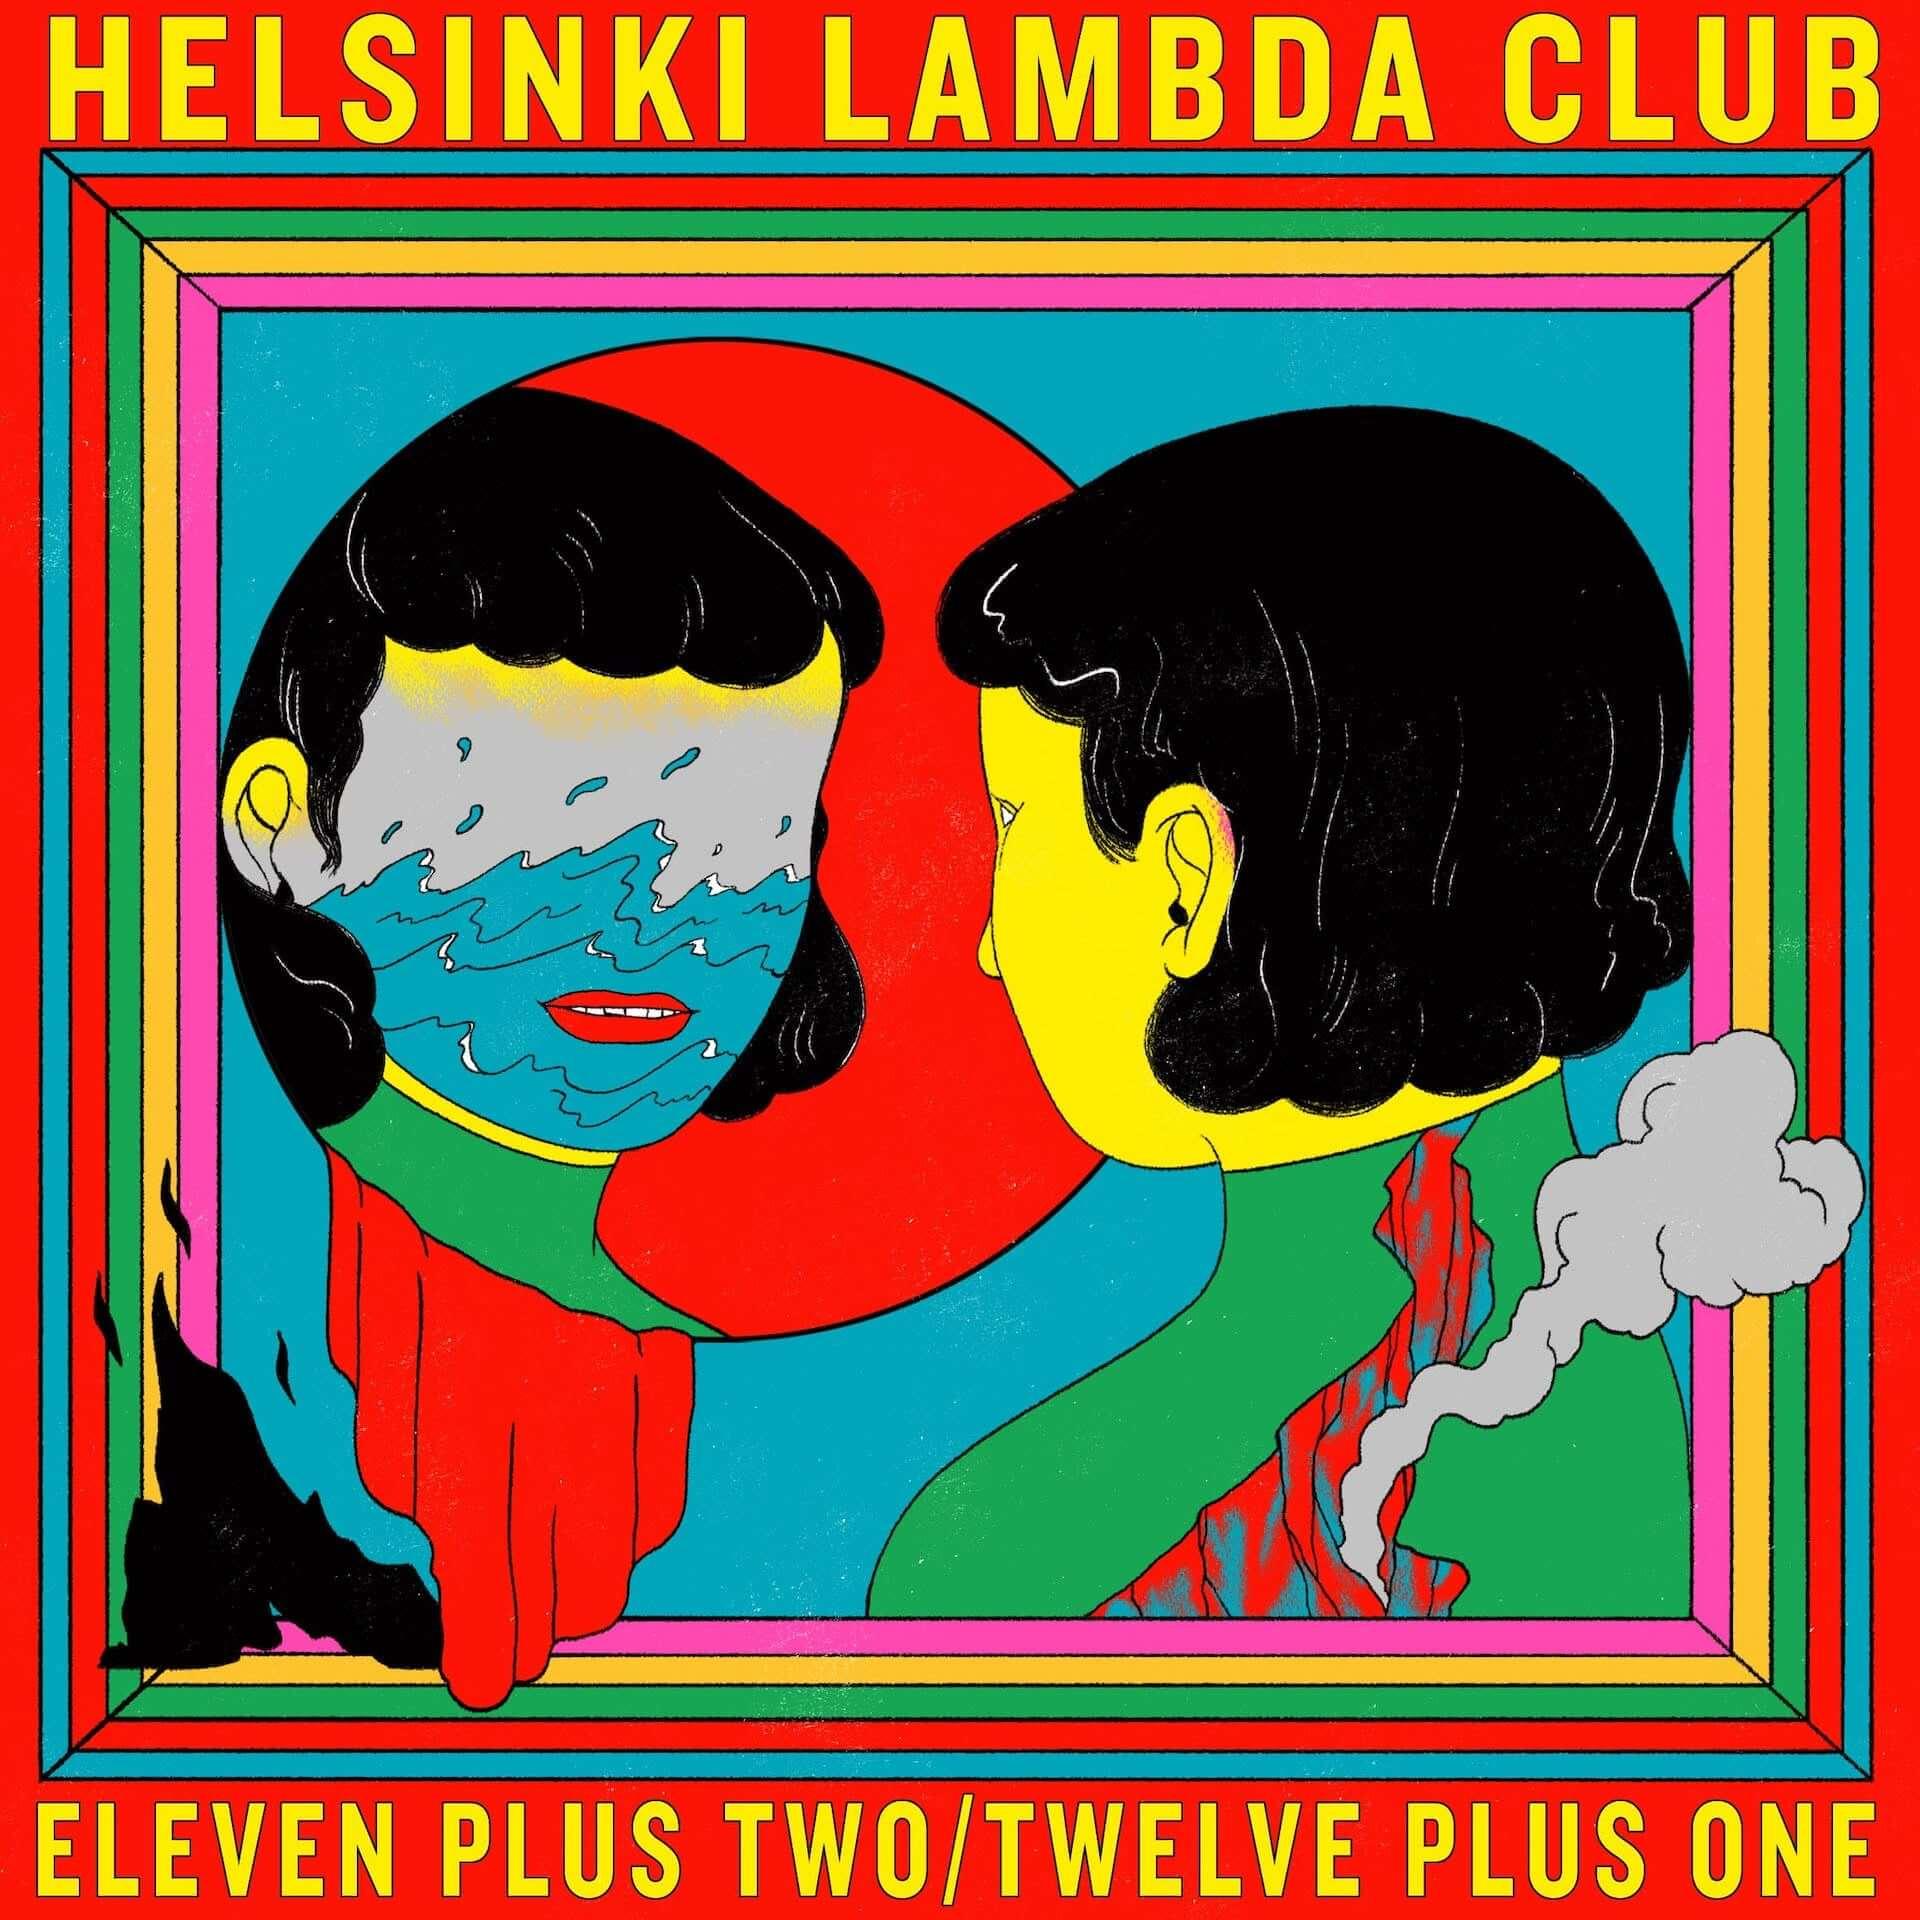 "Helsinki Lambda Club最新作『Eleven plus two/Twelve plus one』のリリースツアーが開催決定!""ミツビシ・マキアート""のライブ映像も公開 music201112_hlc-tour_1-1920x1920"